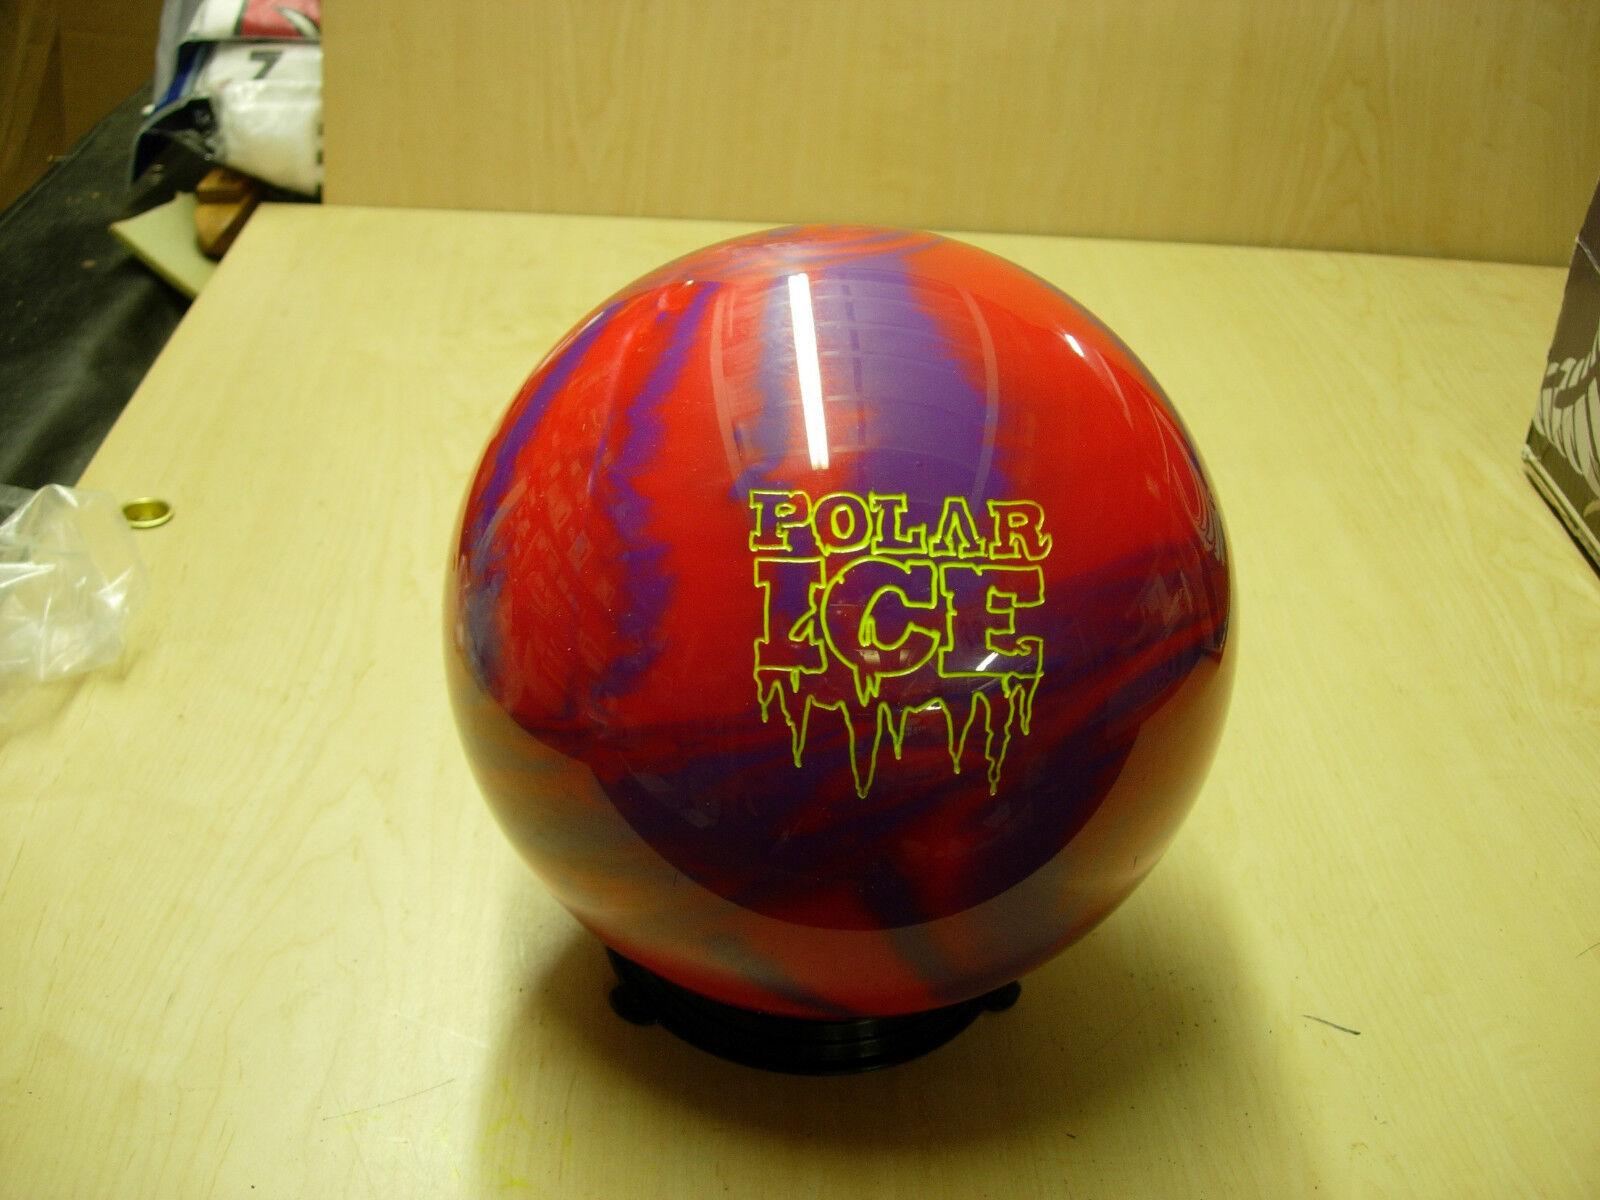 16 0oz Tw 3.75 Storm Polar Ice Red/purple Pearl Urethane Bowling Ball